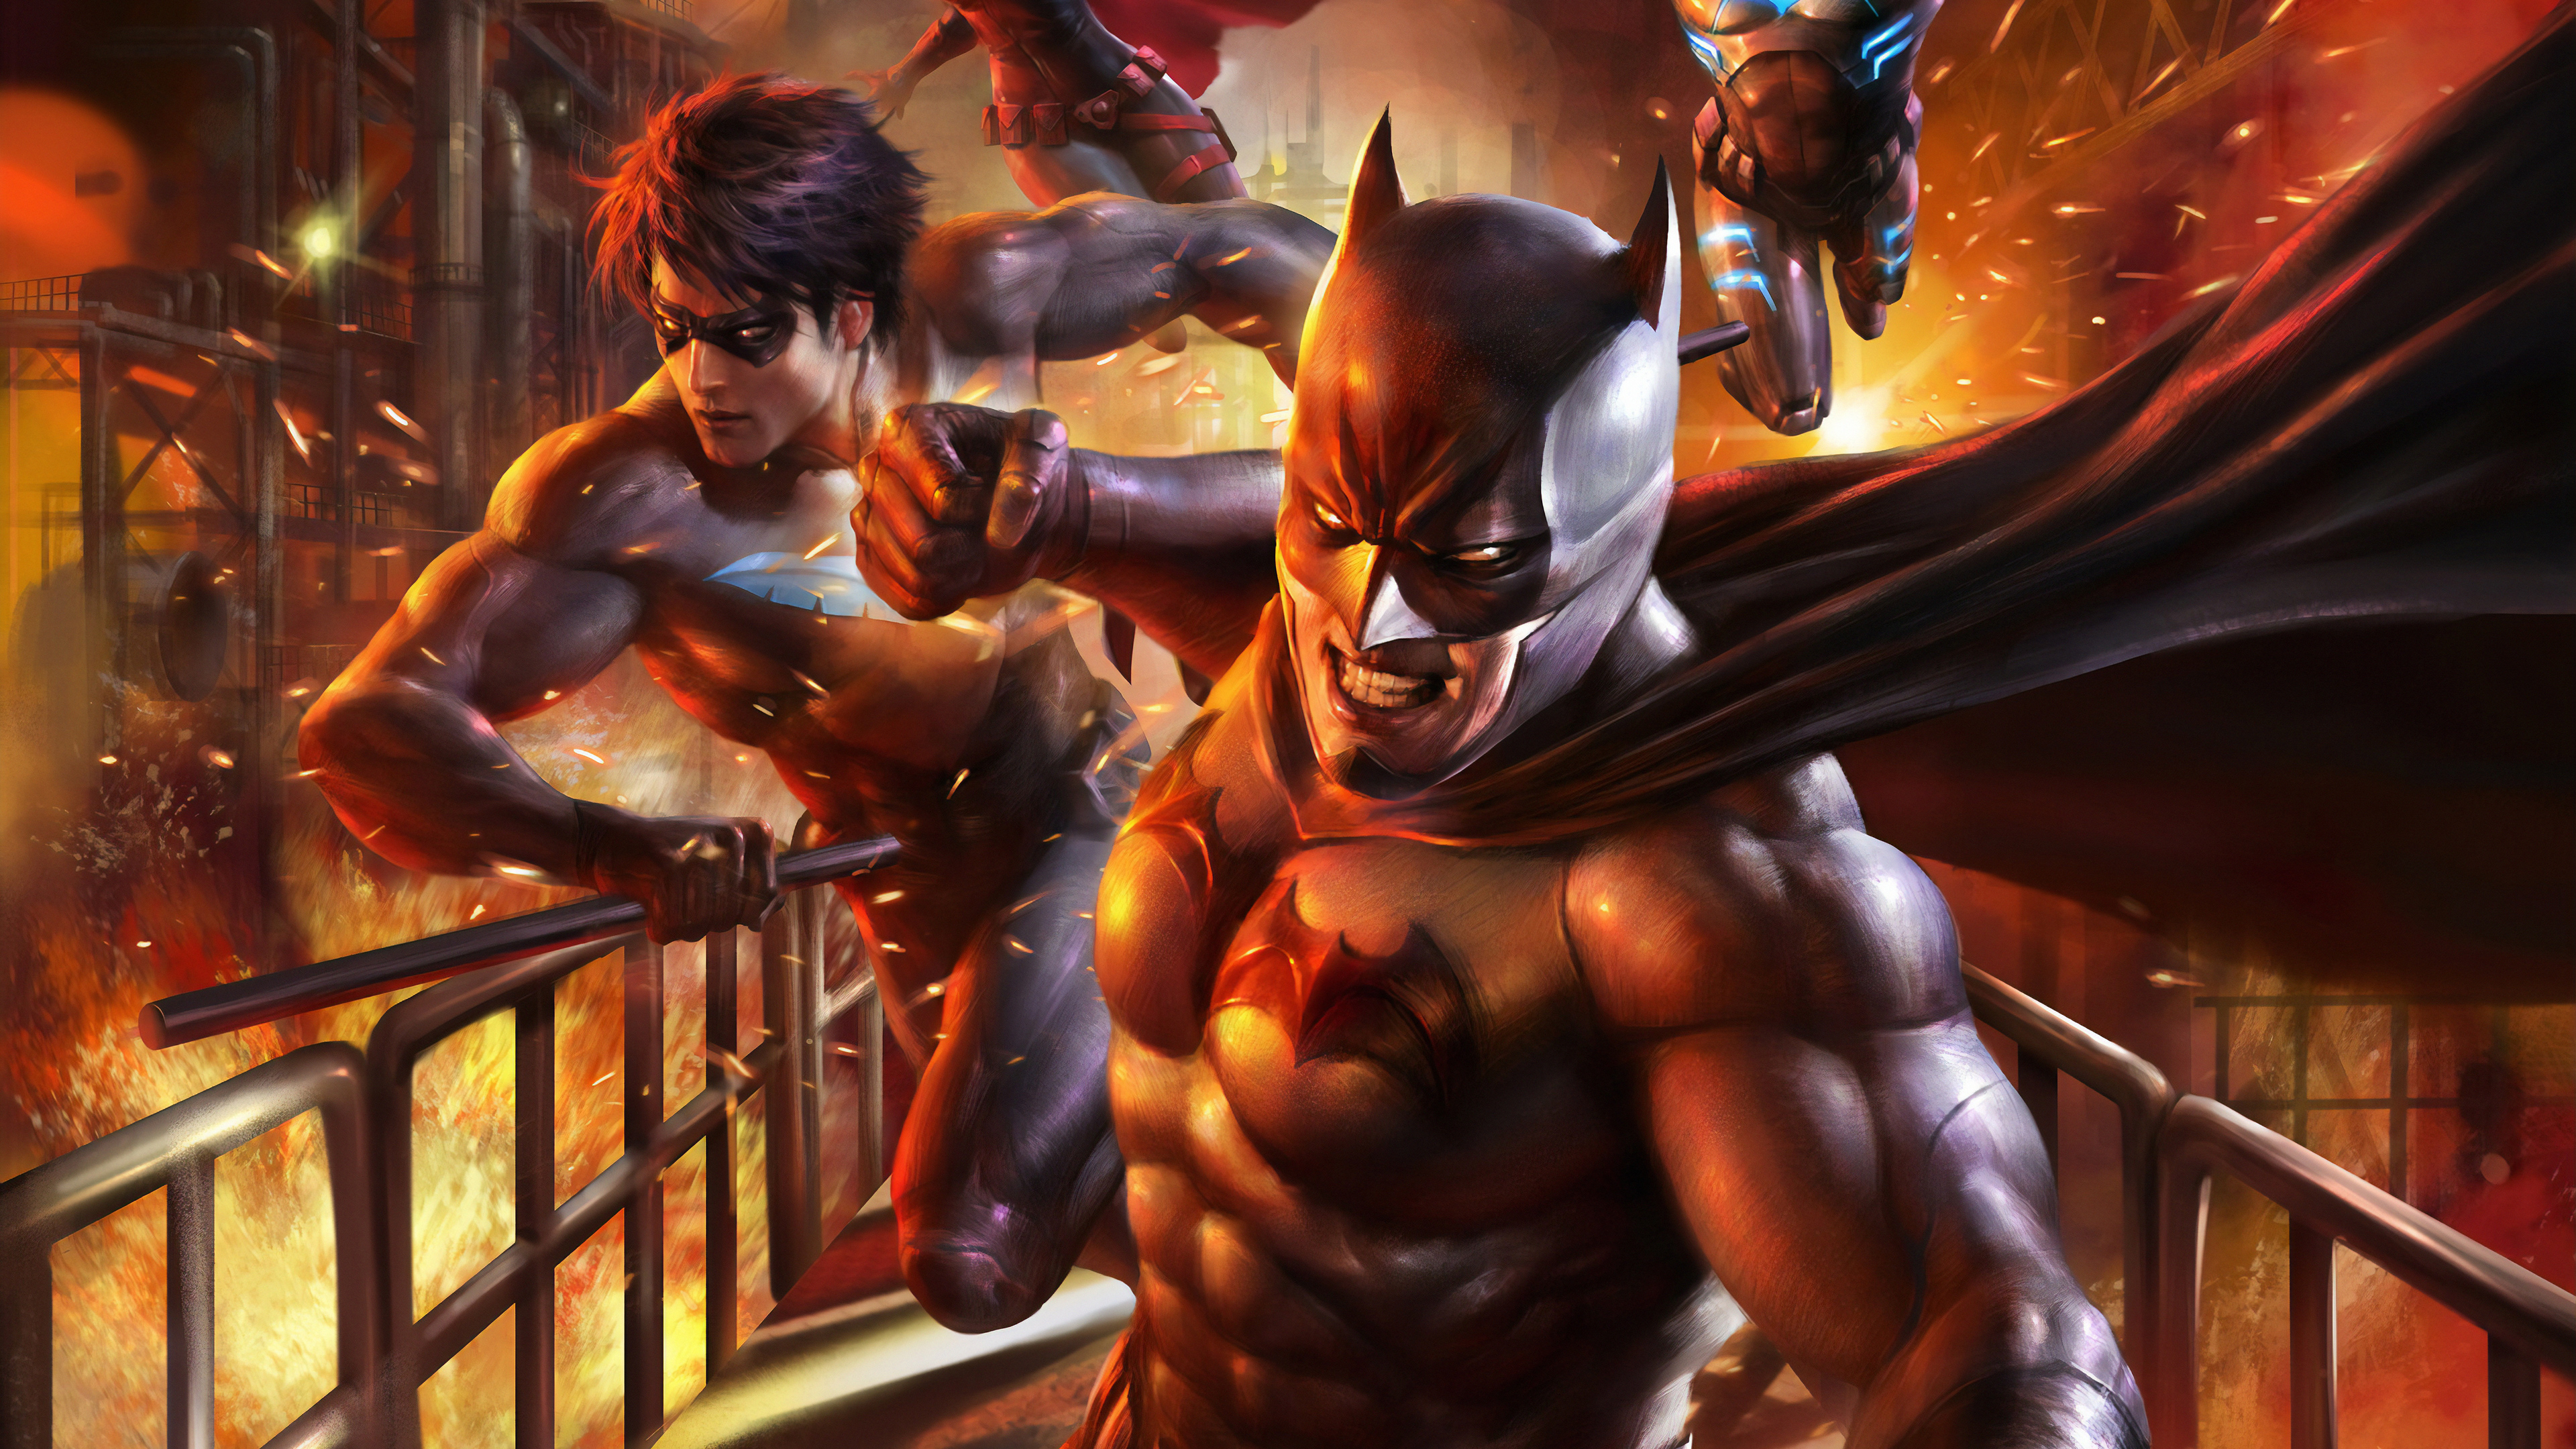 Batman And Nightwing 4k, HD Superheroes, 4k Wallpapers ...